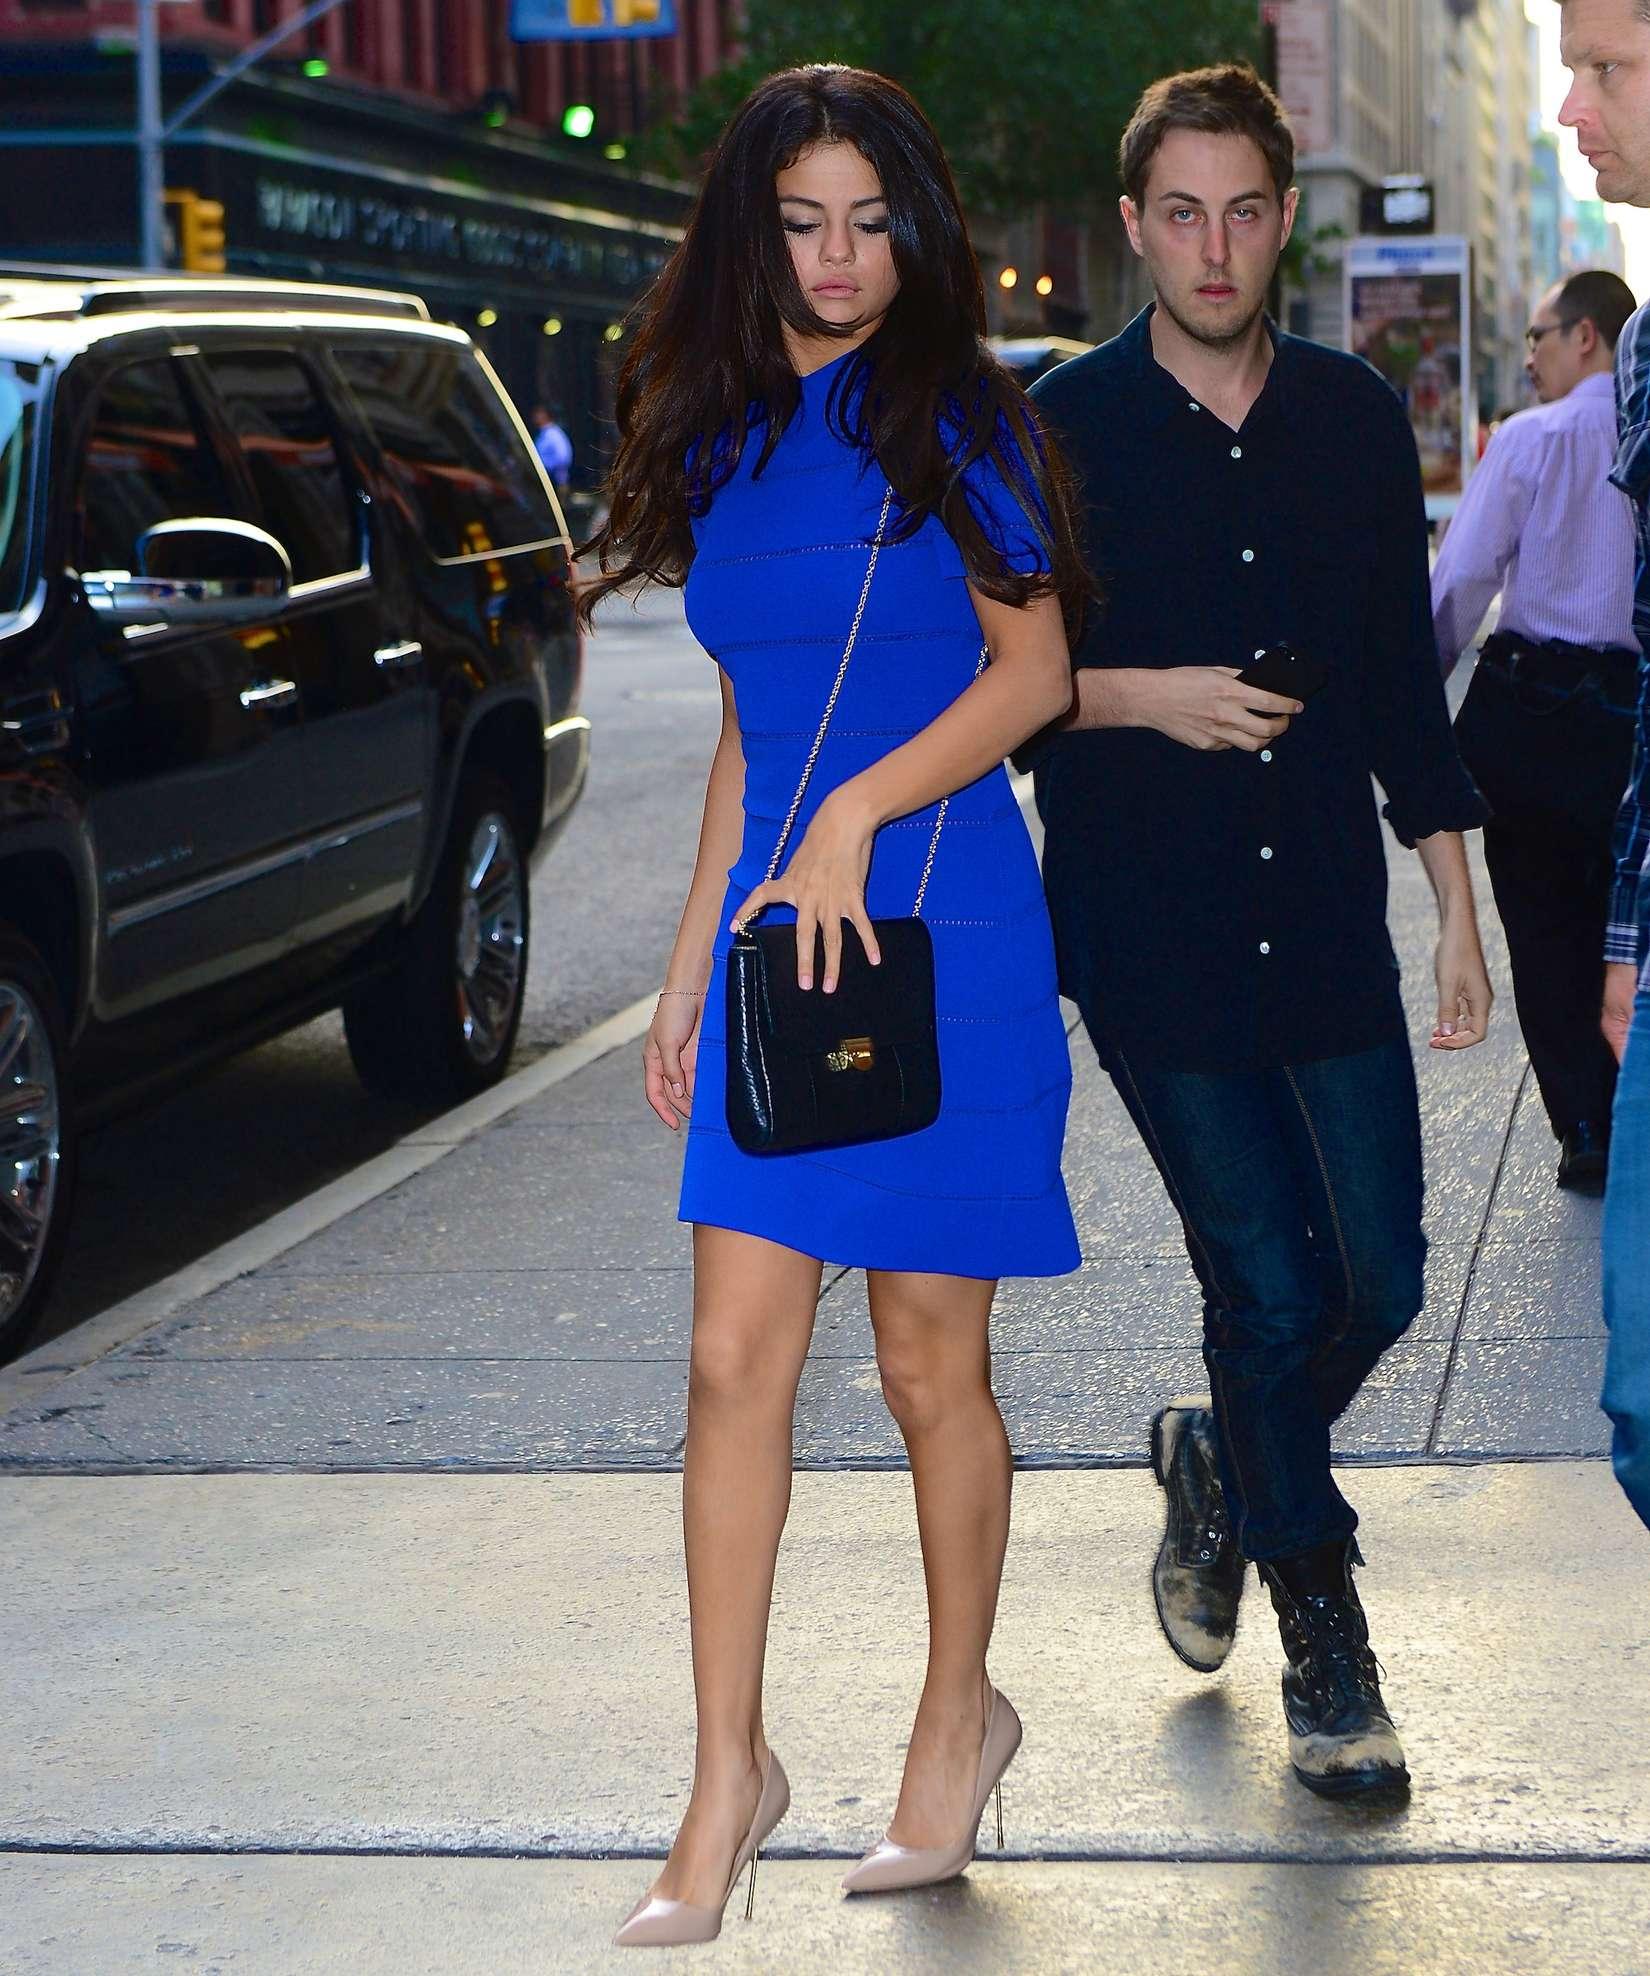 selena gomez hot in blue dress 02 gotceleb